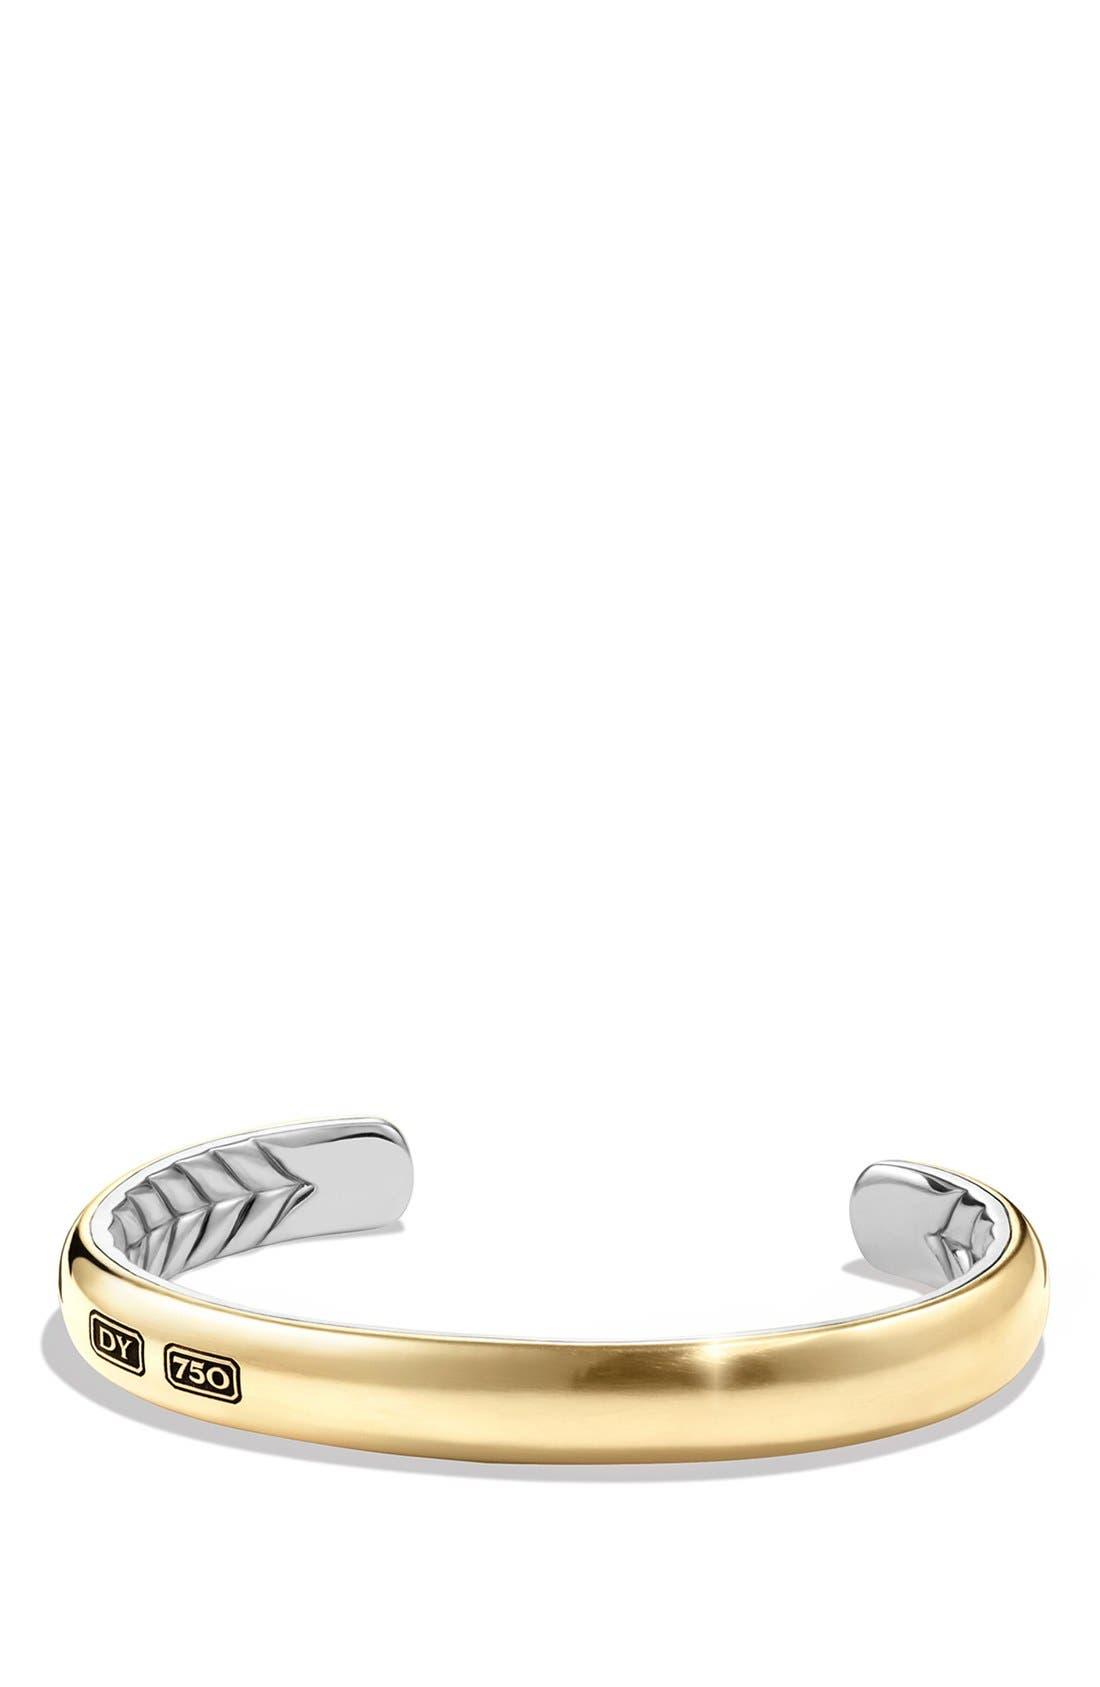 'Streamline' Cuff Bracelet with 18K Gold,                         Main,                         color, 040